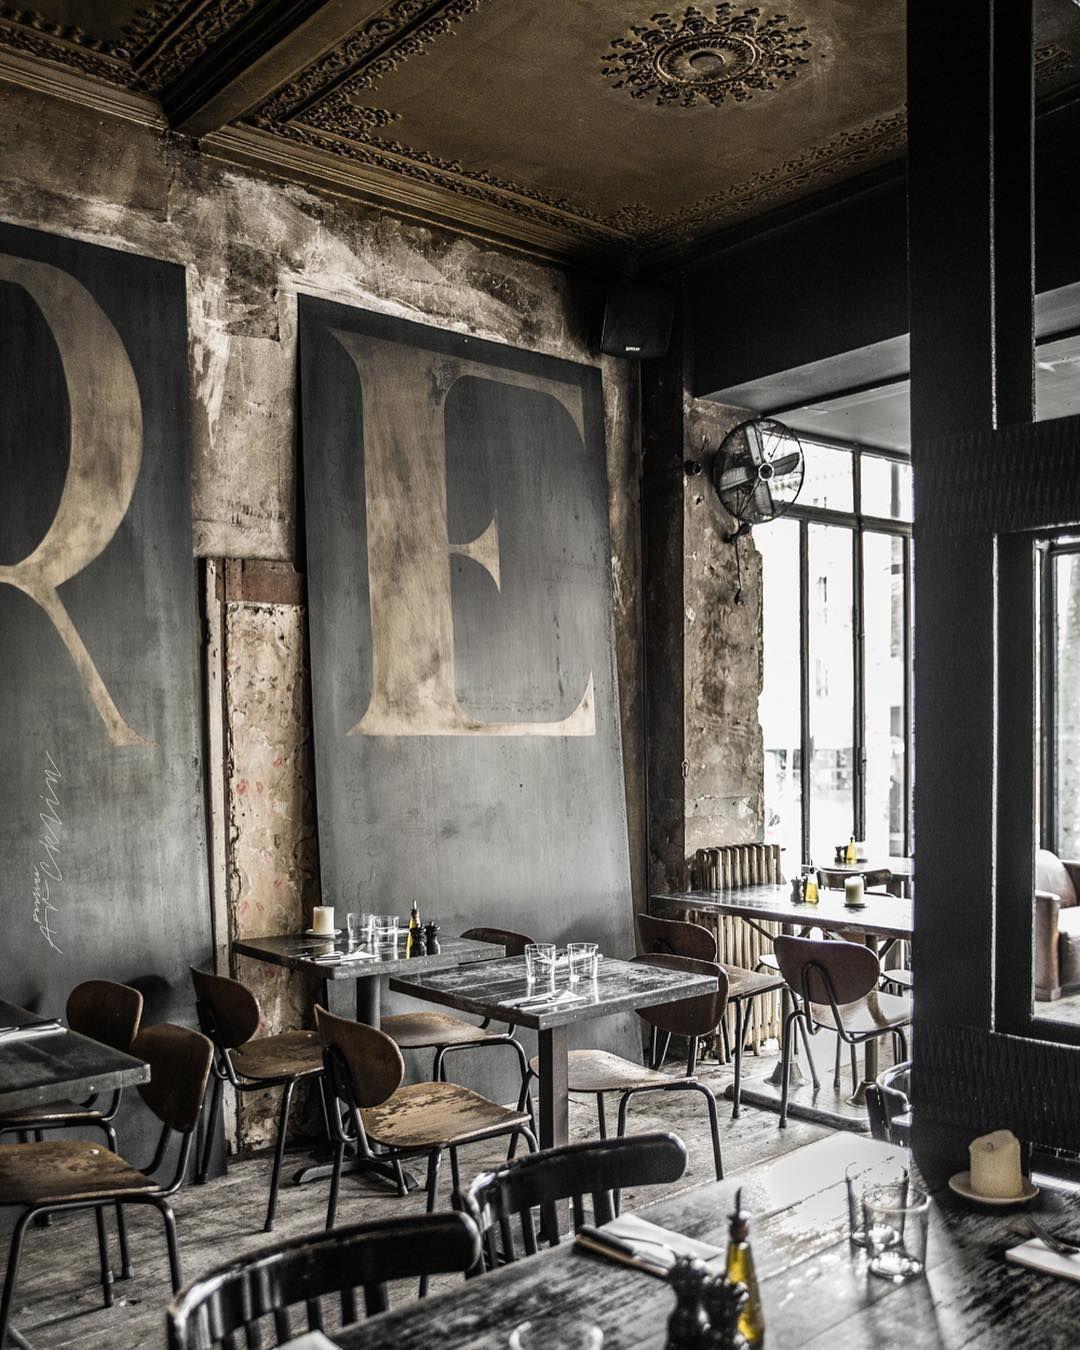 Epingle Par Christian Hornemann Sur Bar Design Bar Restaurant Design D Interieur De Grenier Design Interieur Restaurant